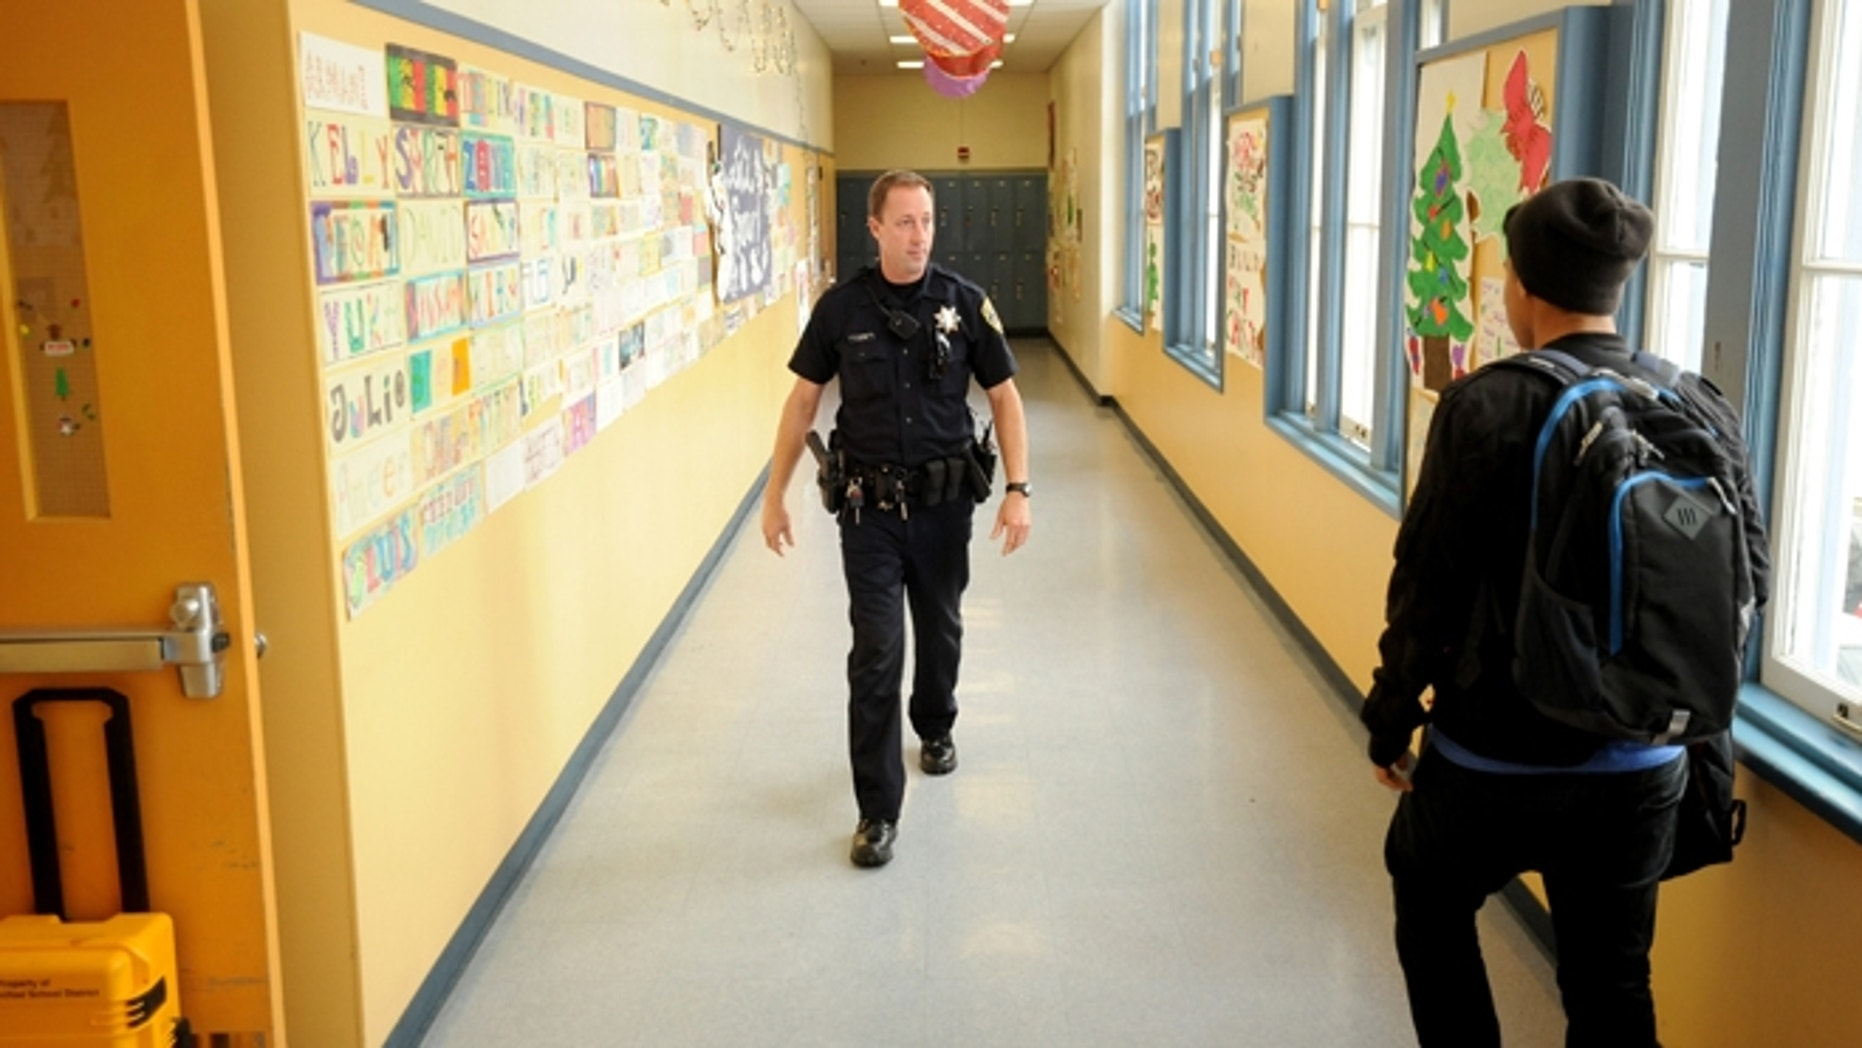 Oakland Calif. Police Officer Rick Moore patrols Oakland Technical High School. (AP Photo/Noah Berger)